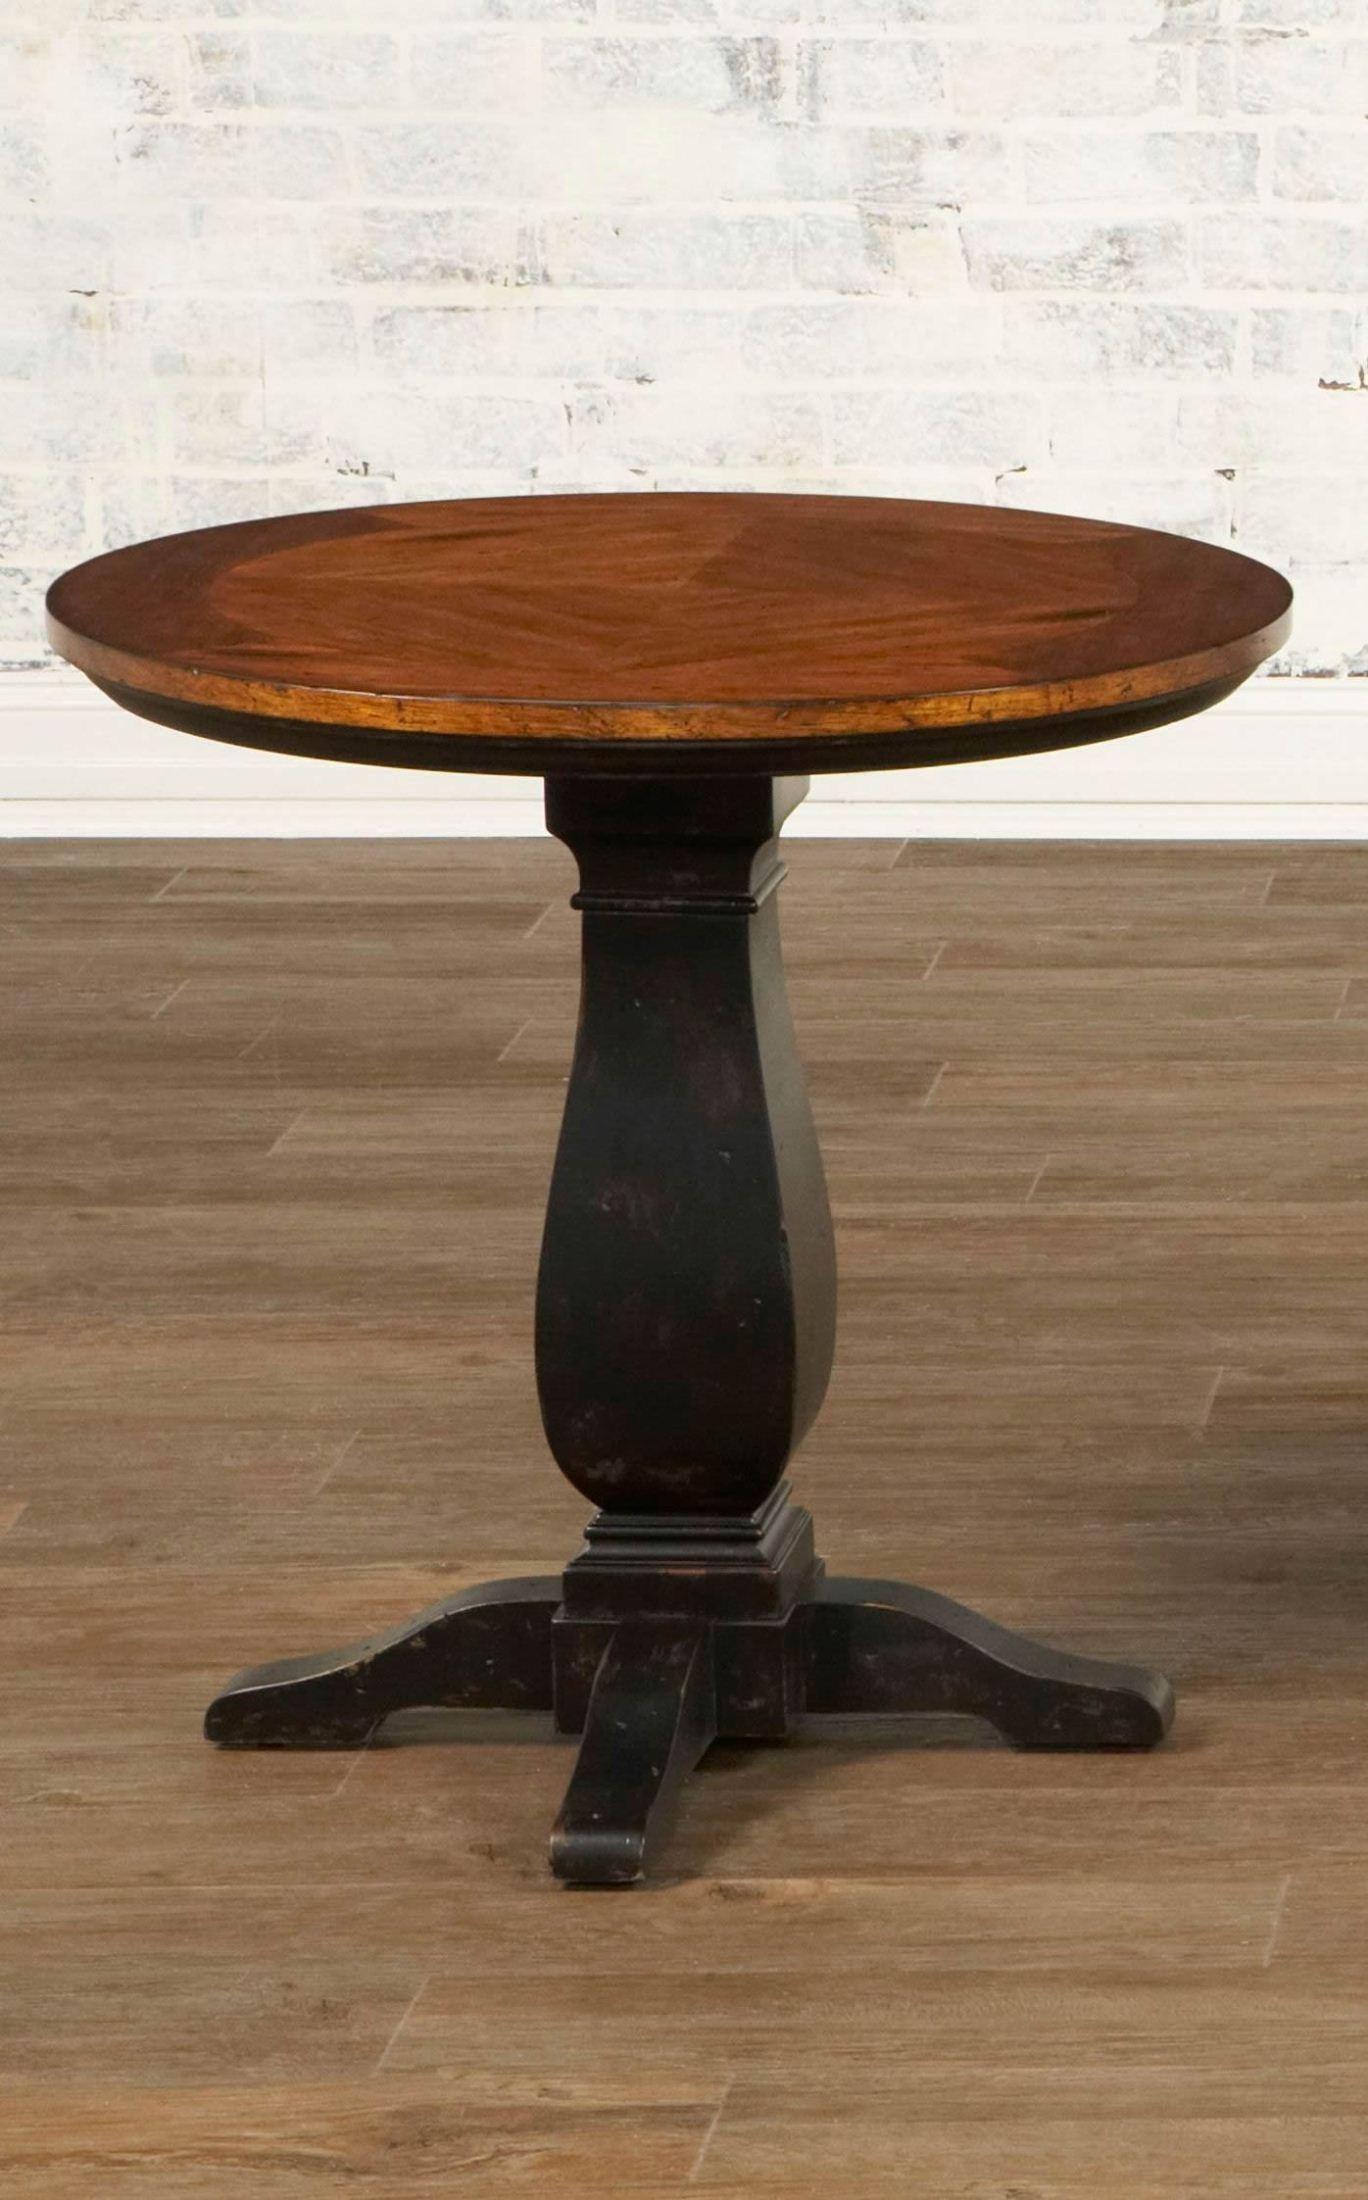 newbury round pedestal end table from largo t557 124 coleman furniture. Black Bedroom Furniture Sets. Home Design Ideas